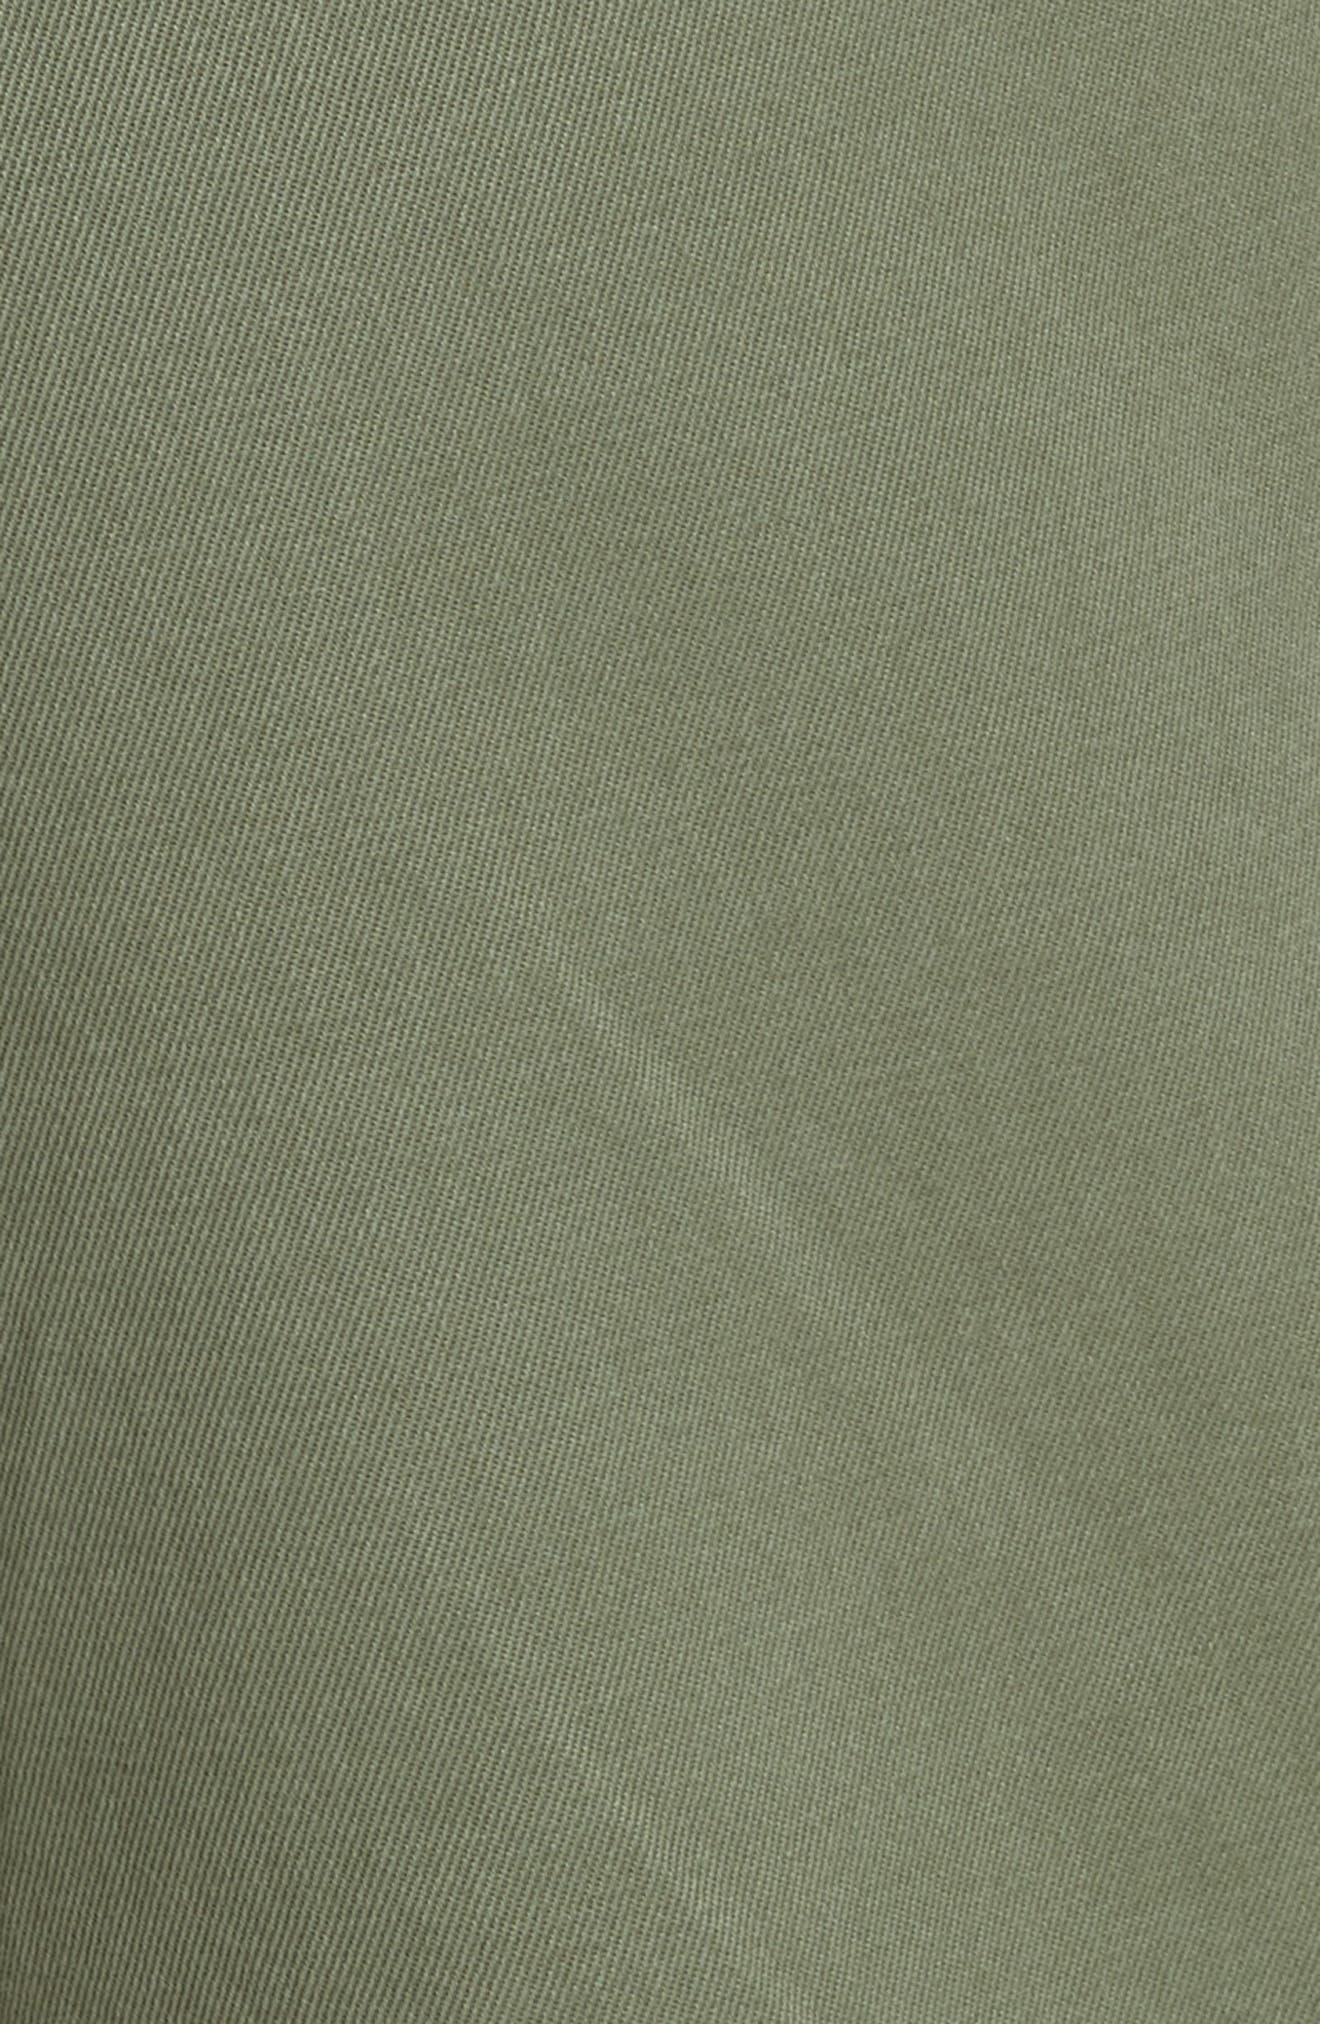 Chino Pants,                             Alternate thumbnail 5, color,                             KAKI JAA